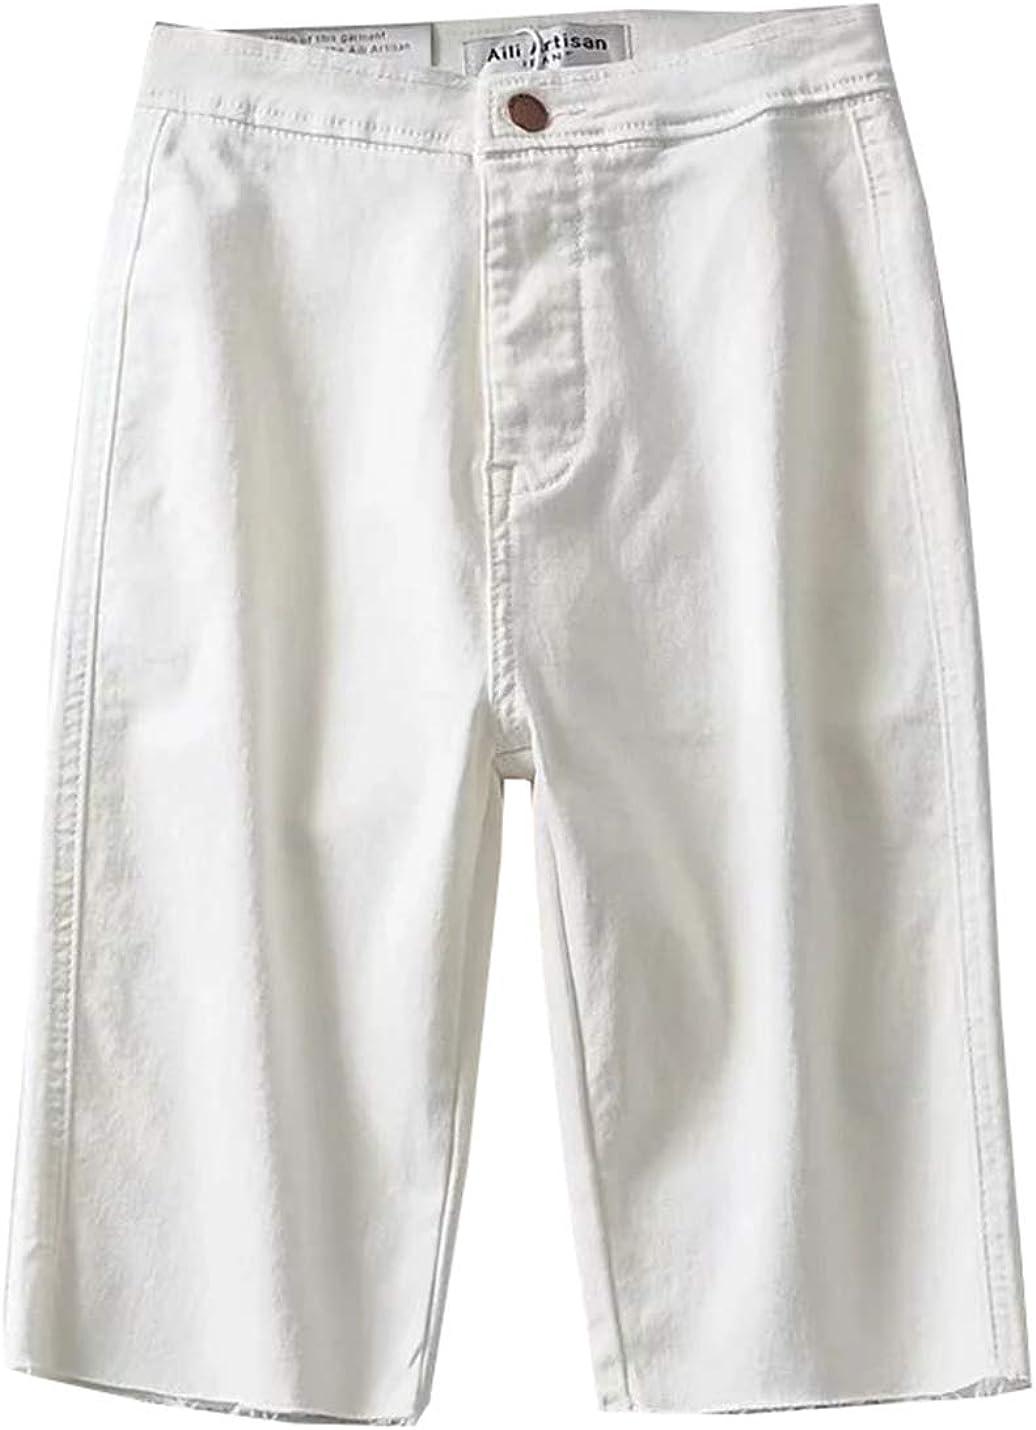 Arlita Women's Fray Hem Stretch Bermuda Jean Short Denim Shorts